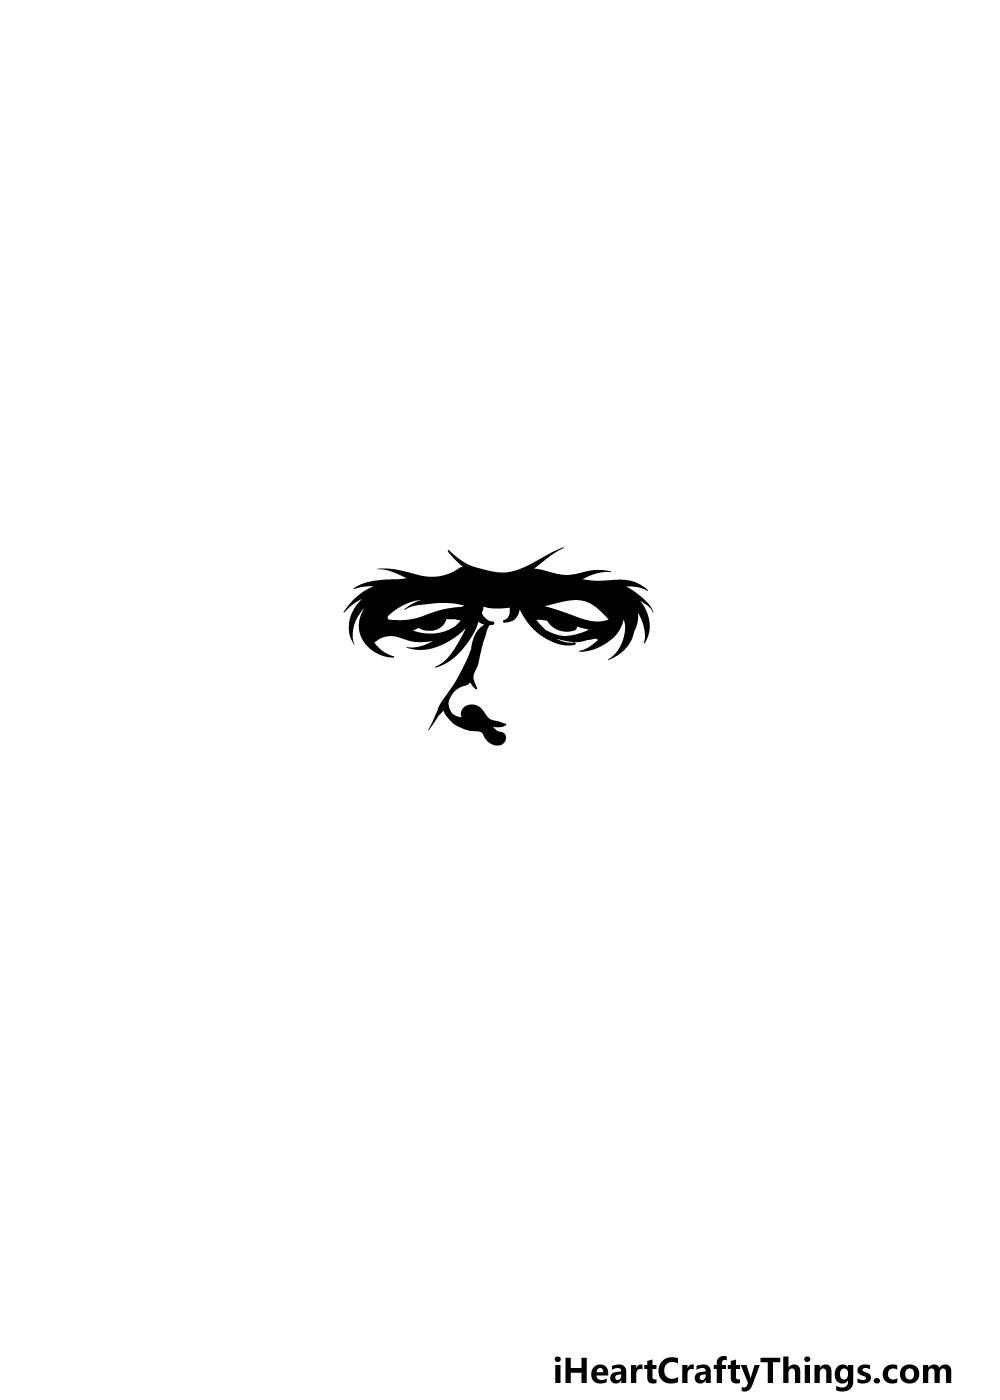 Drawing Frankenstein step 1